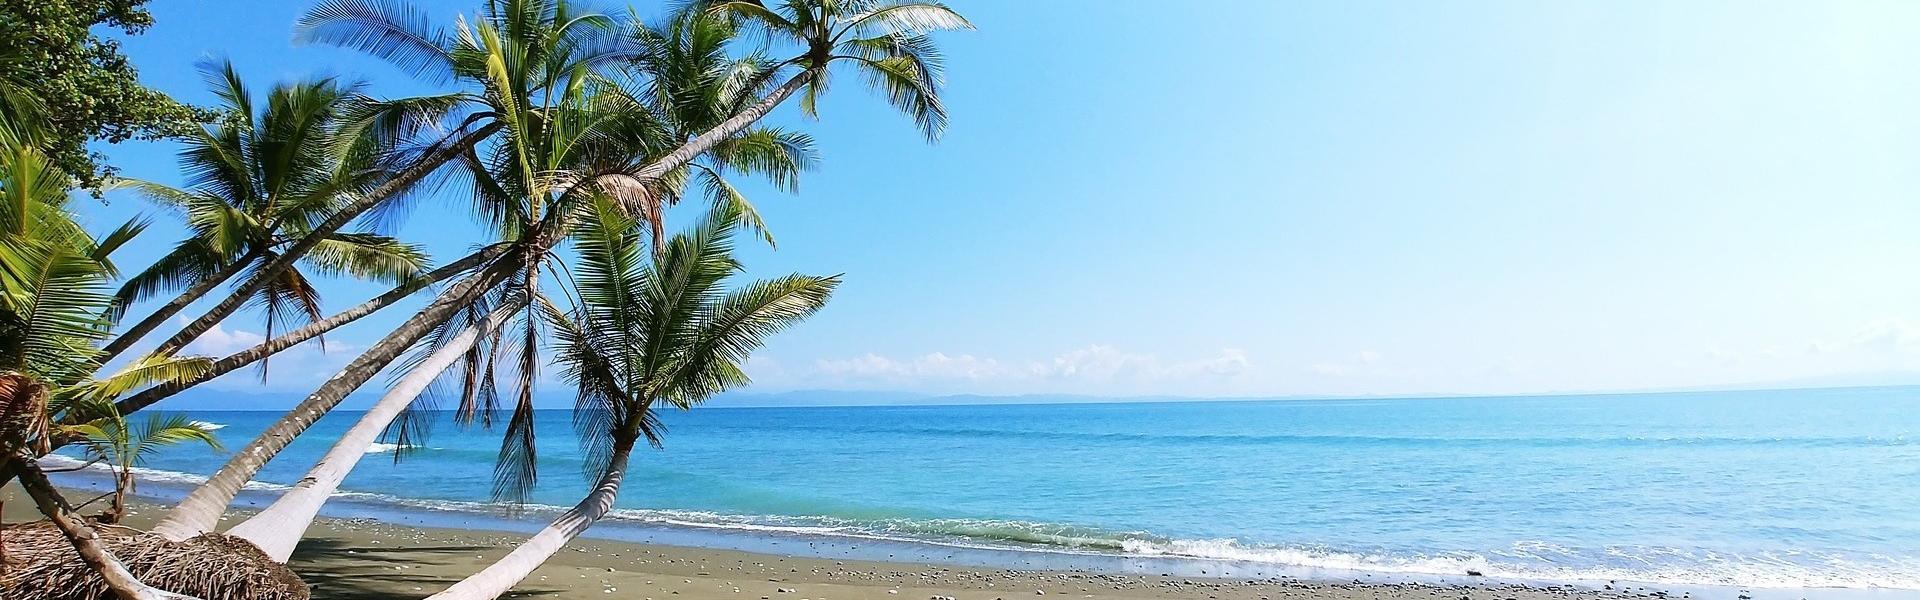 Costa Rica-i utazások